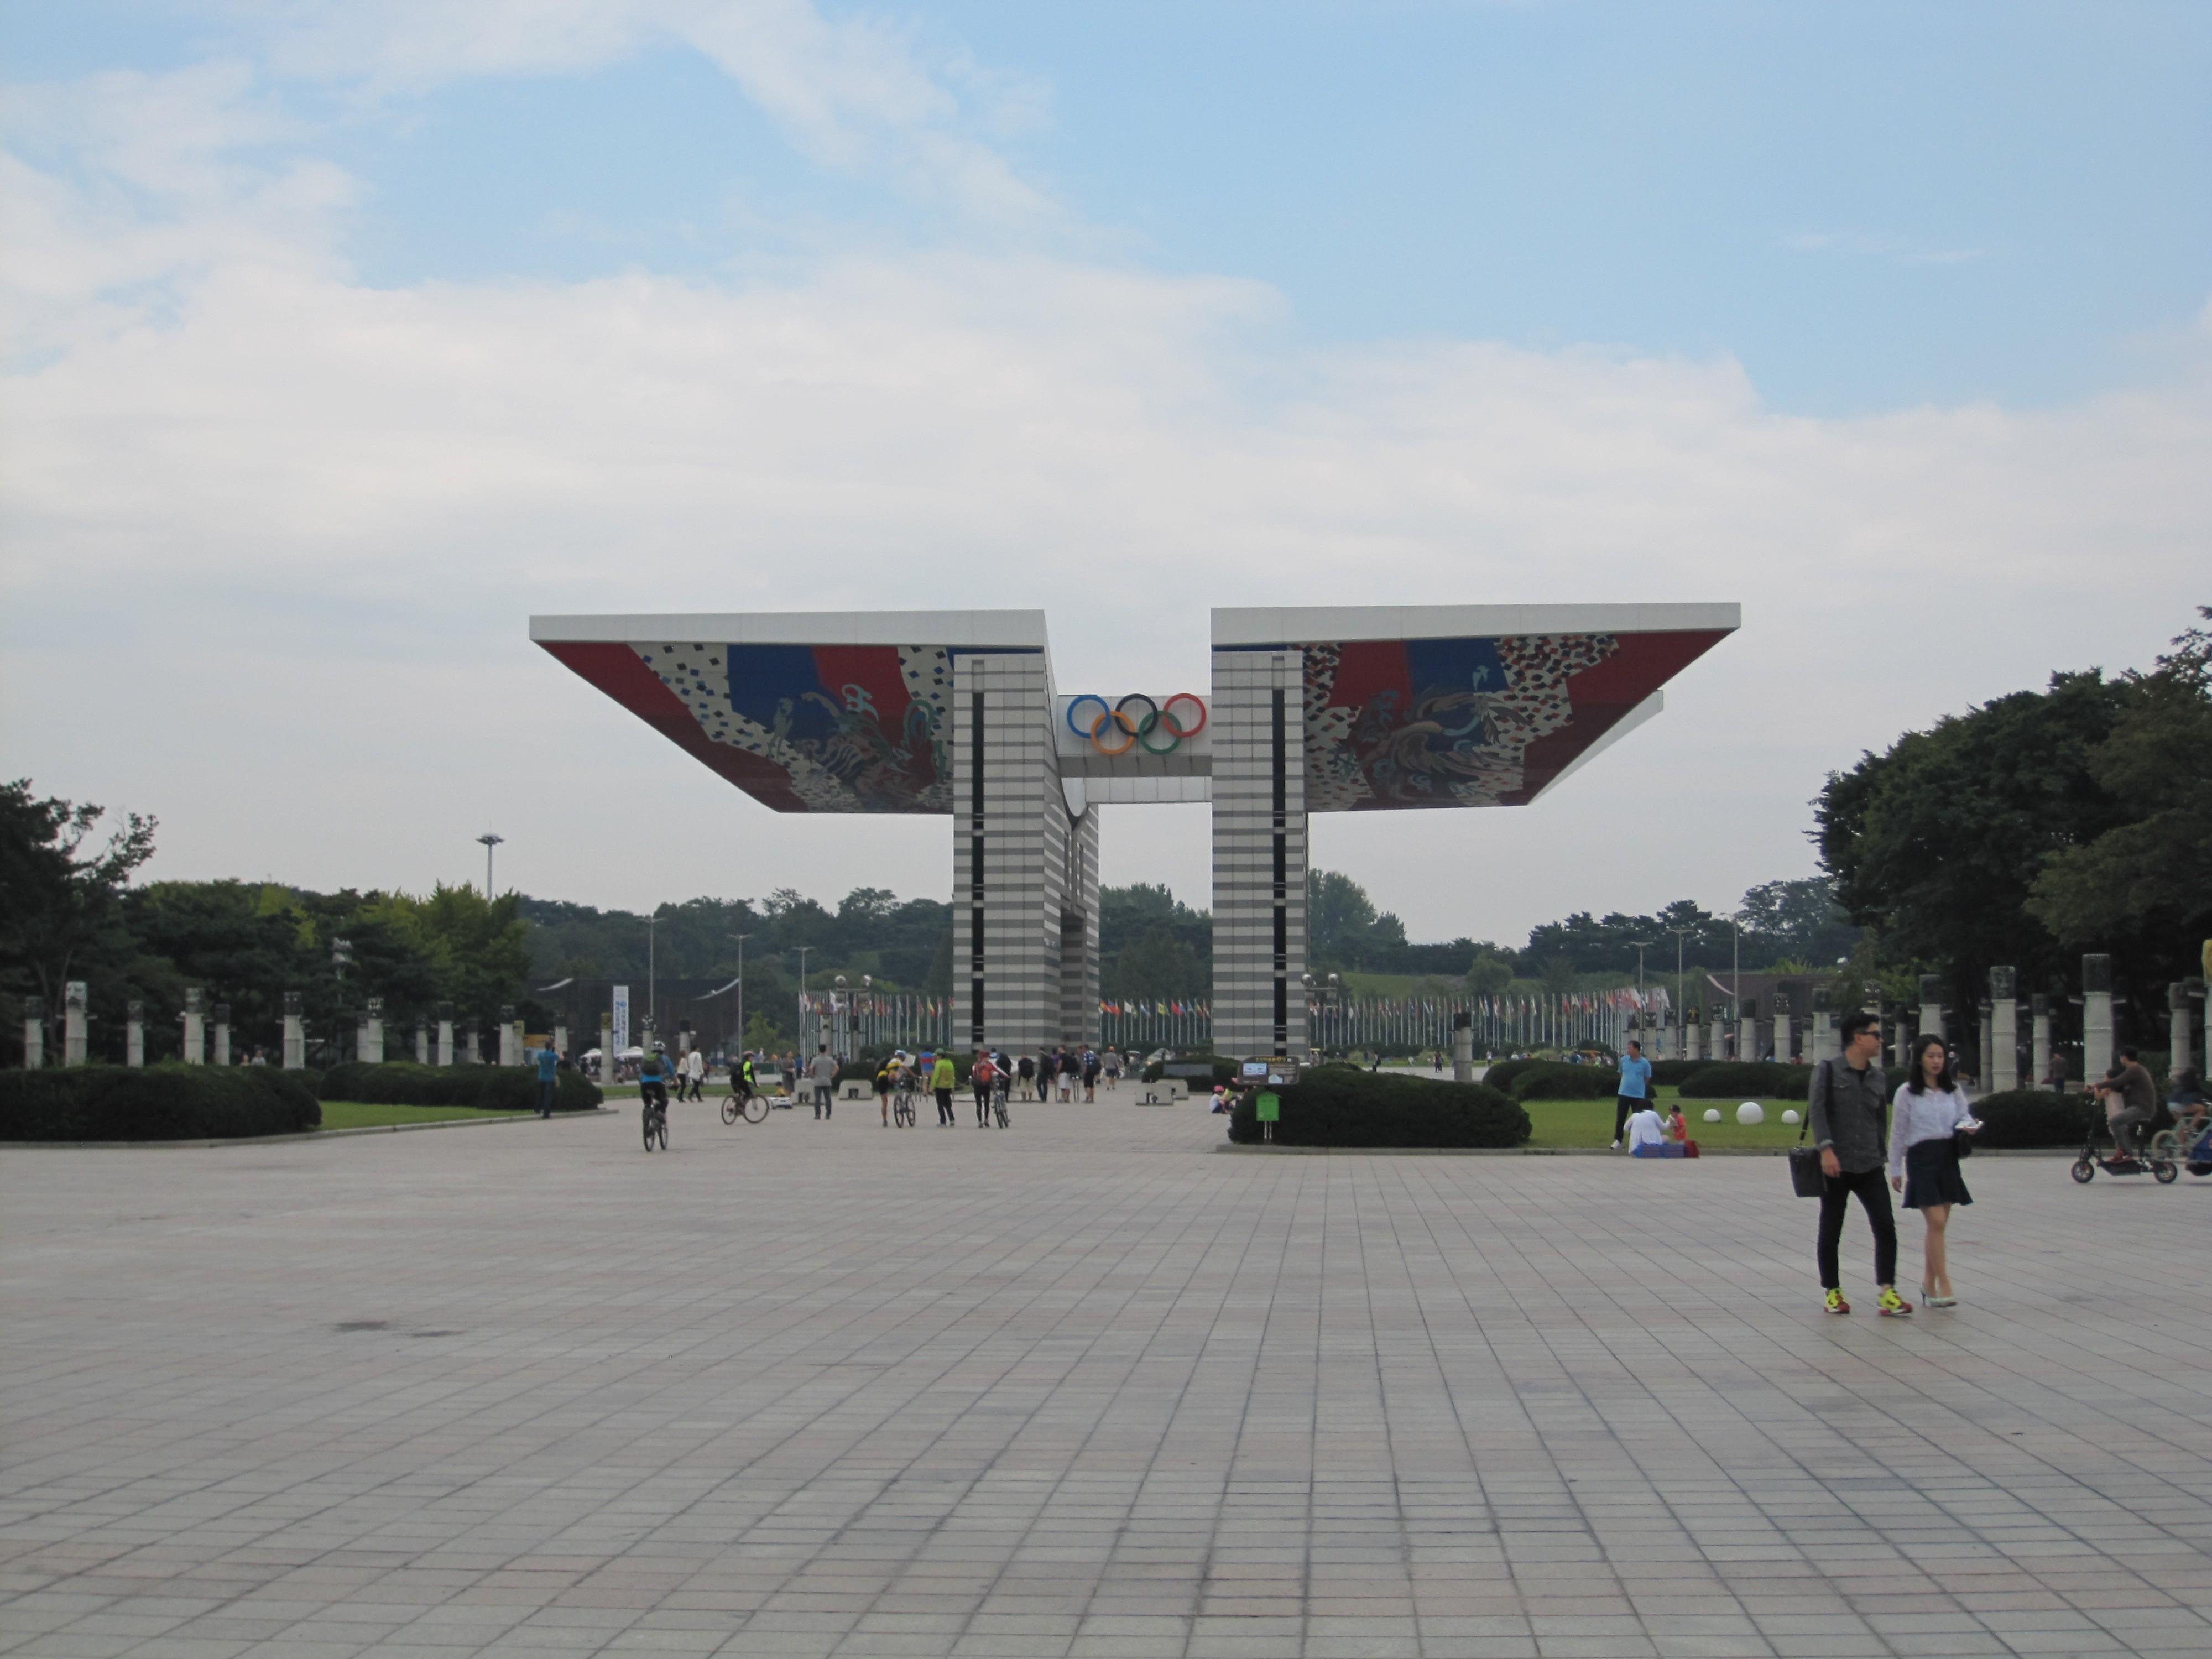 South Gate 4 (World Peace Gate)